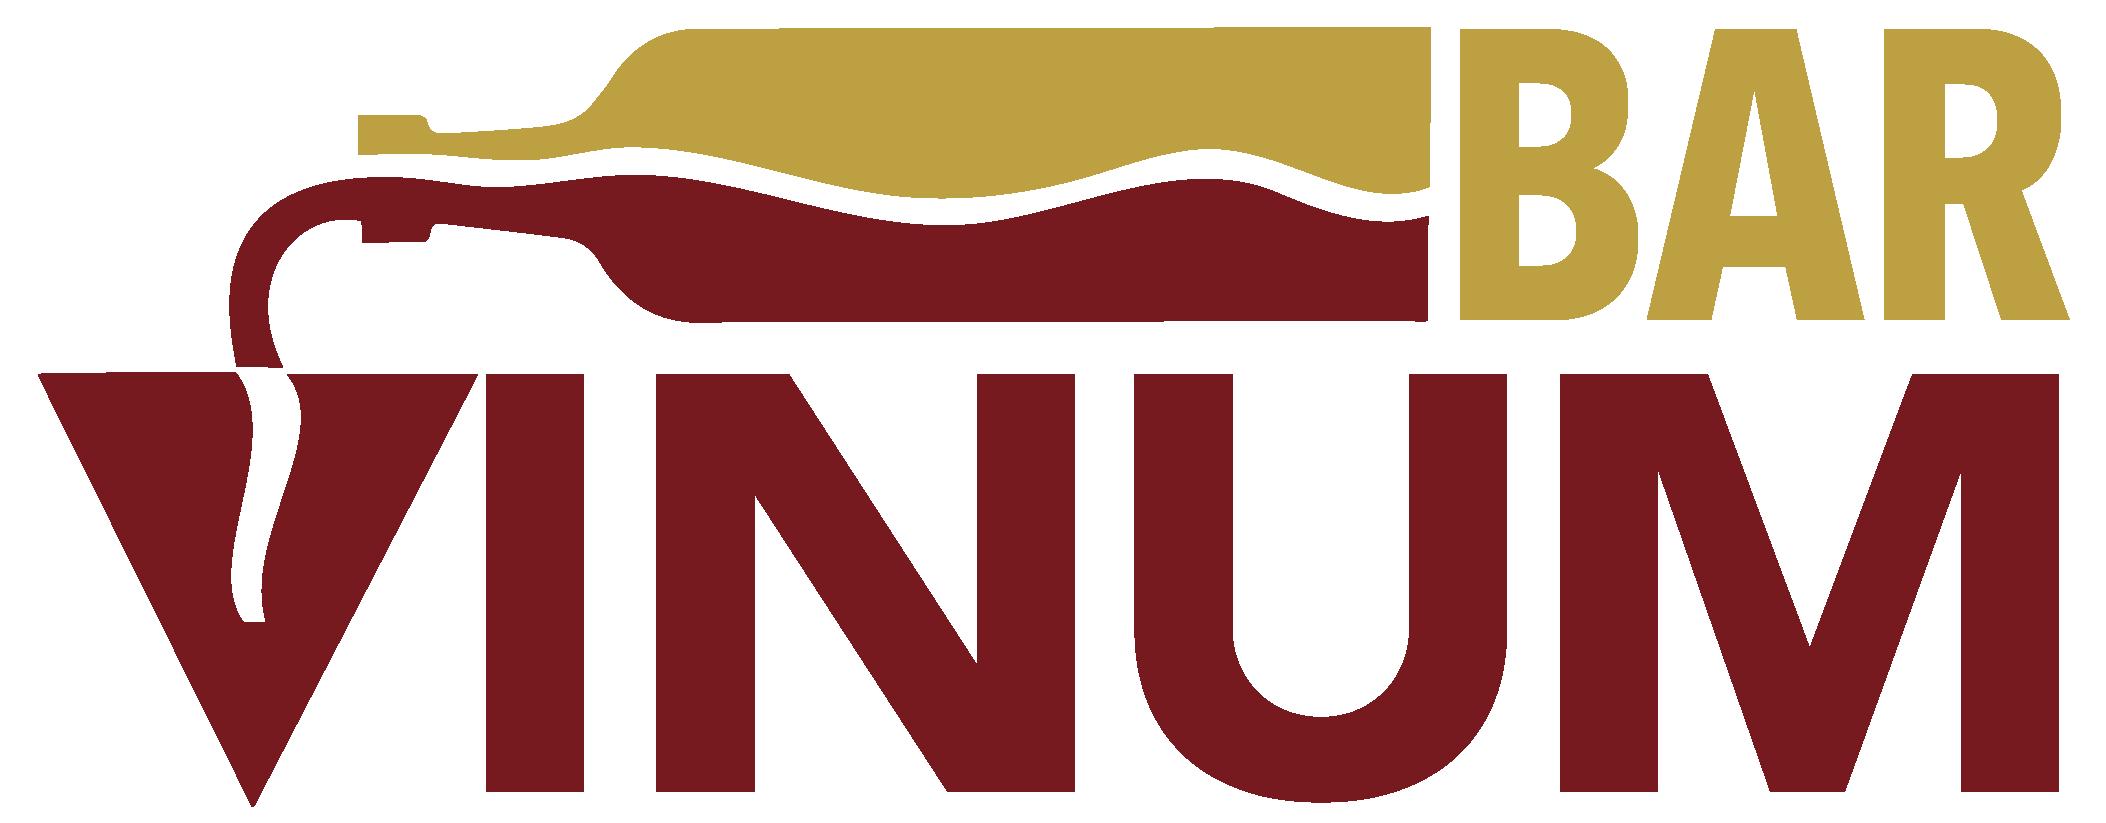 Vinum Bar And Tapas Logo